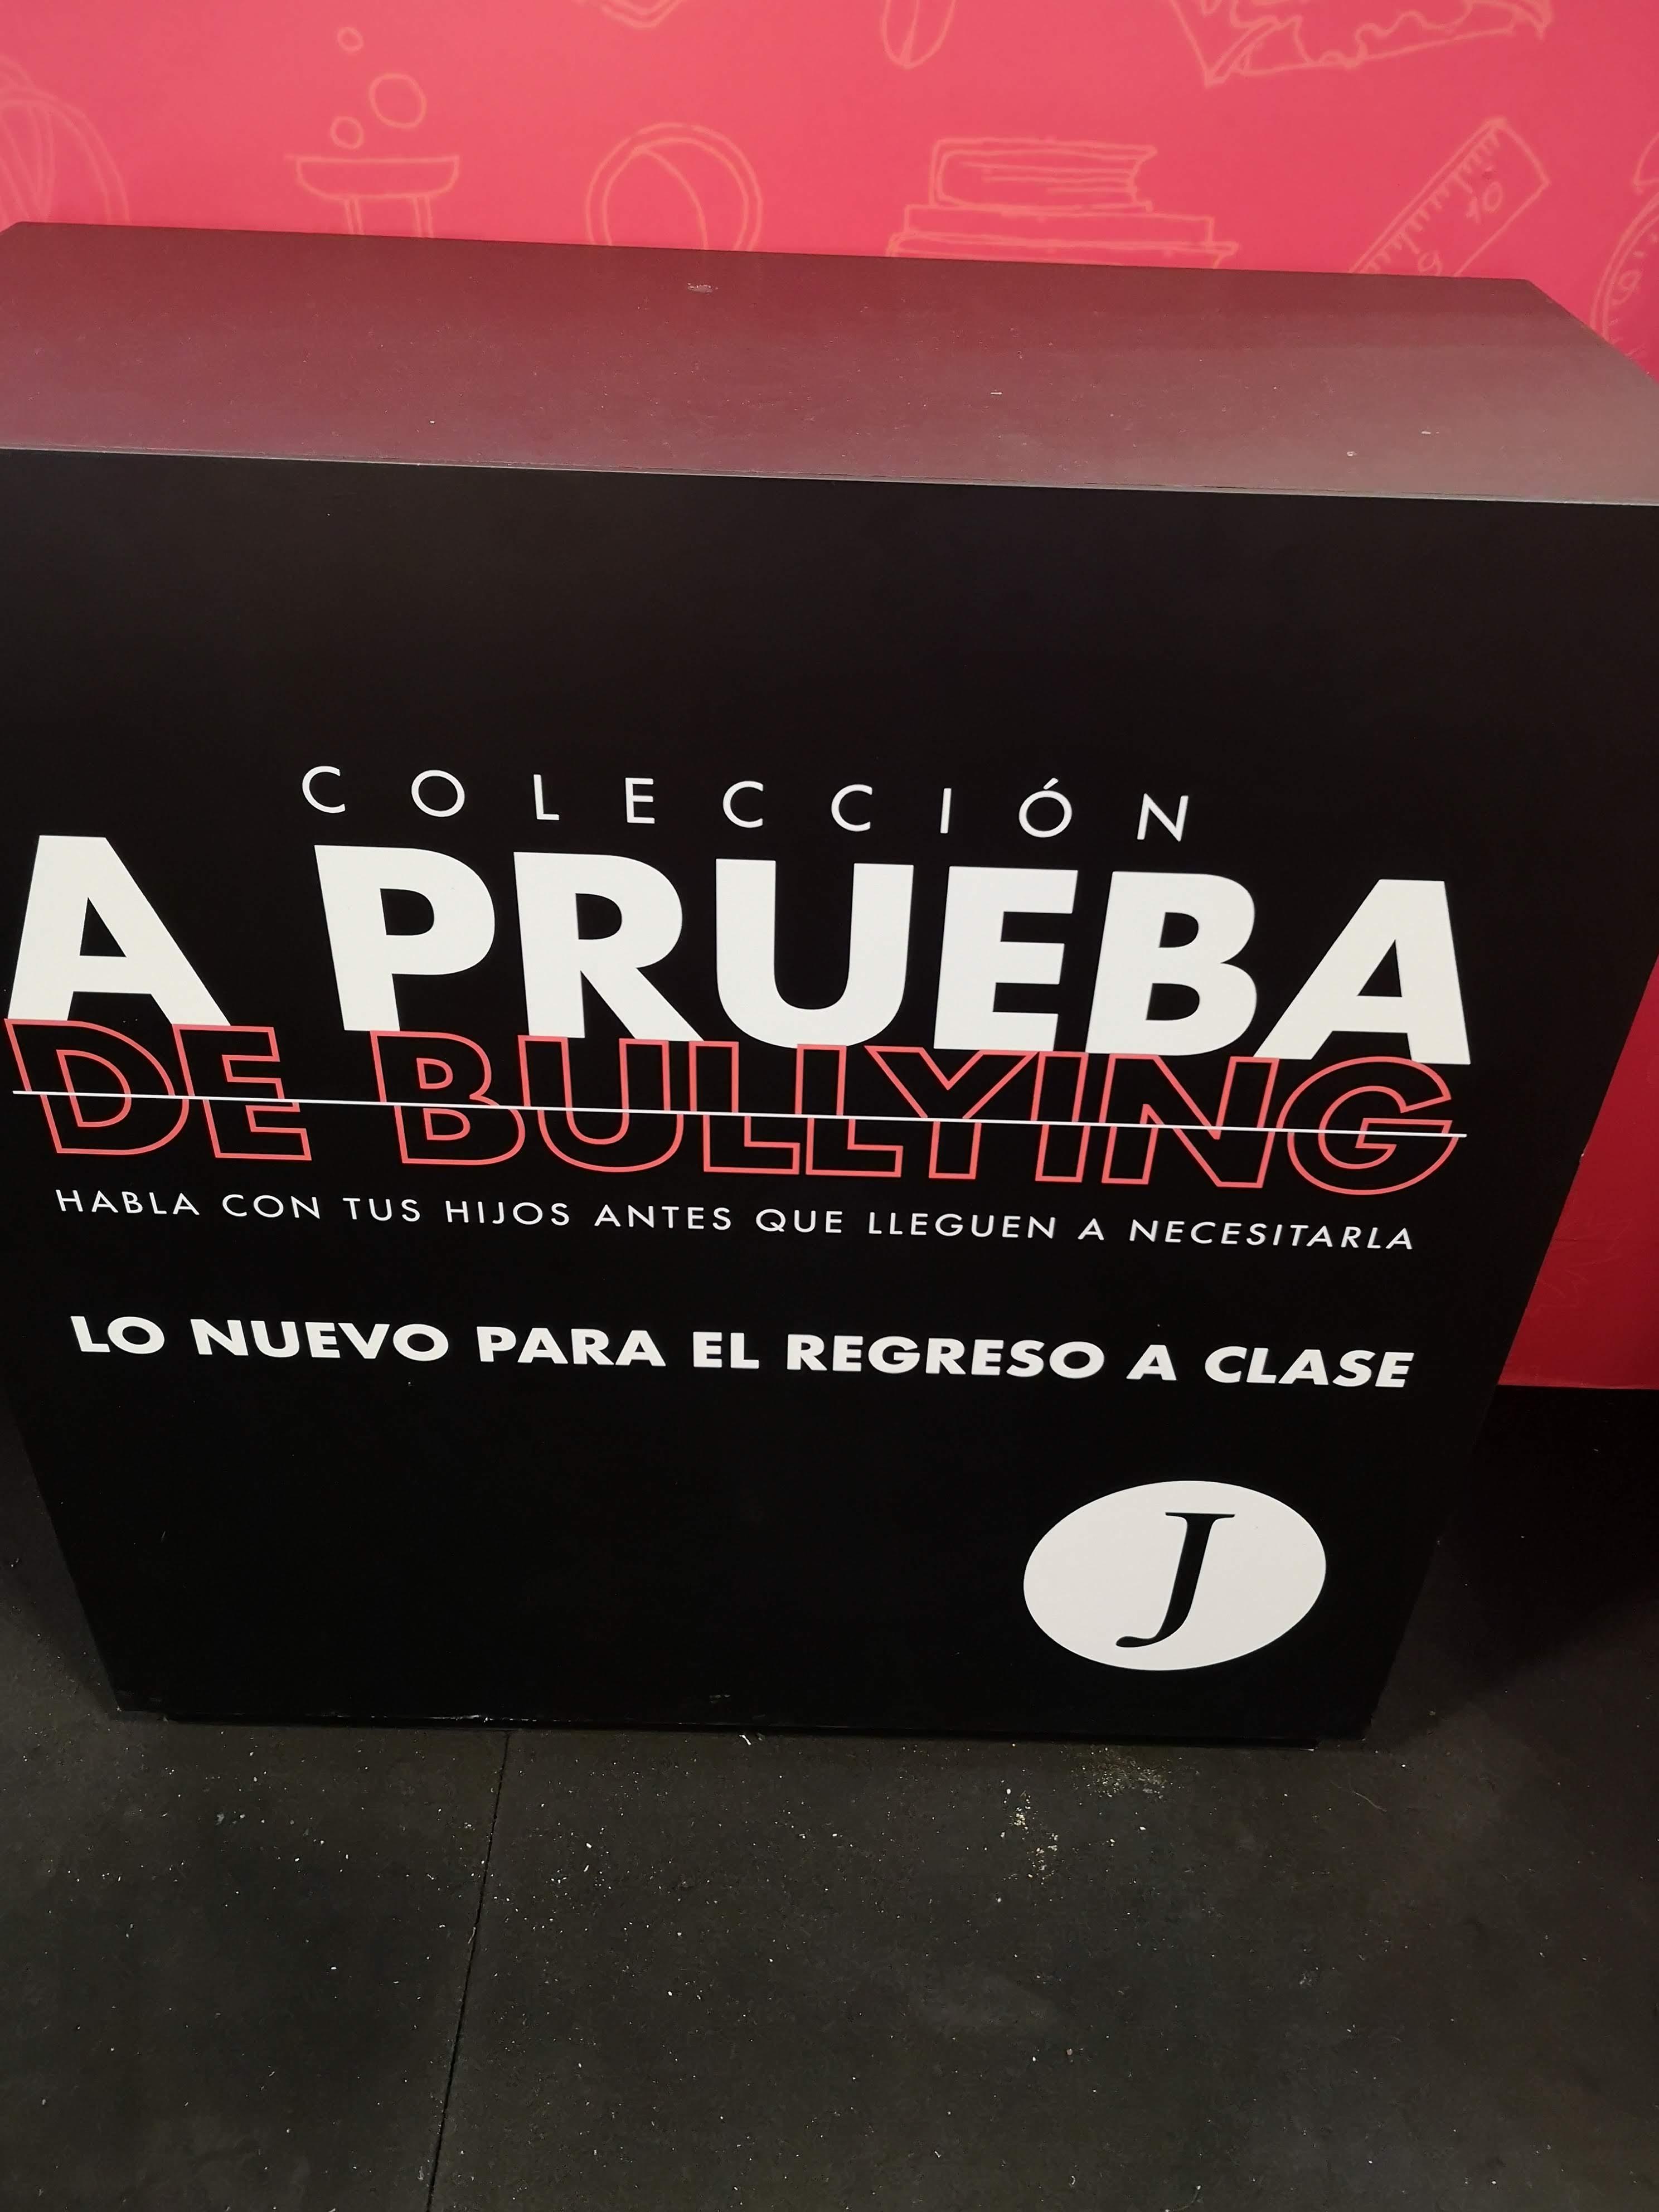 Venta de artículos antibullying SISEVE